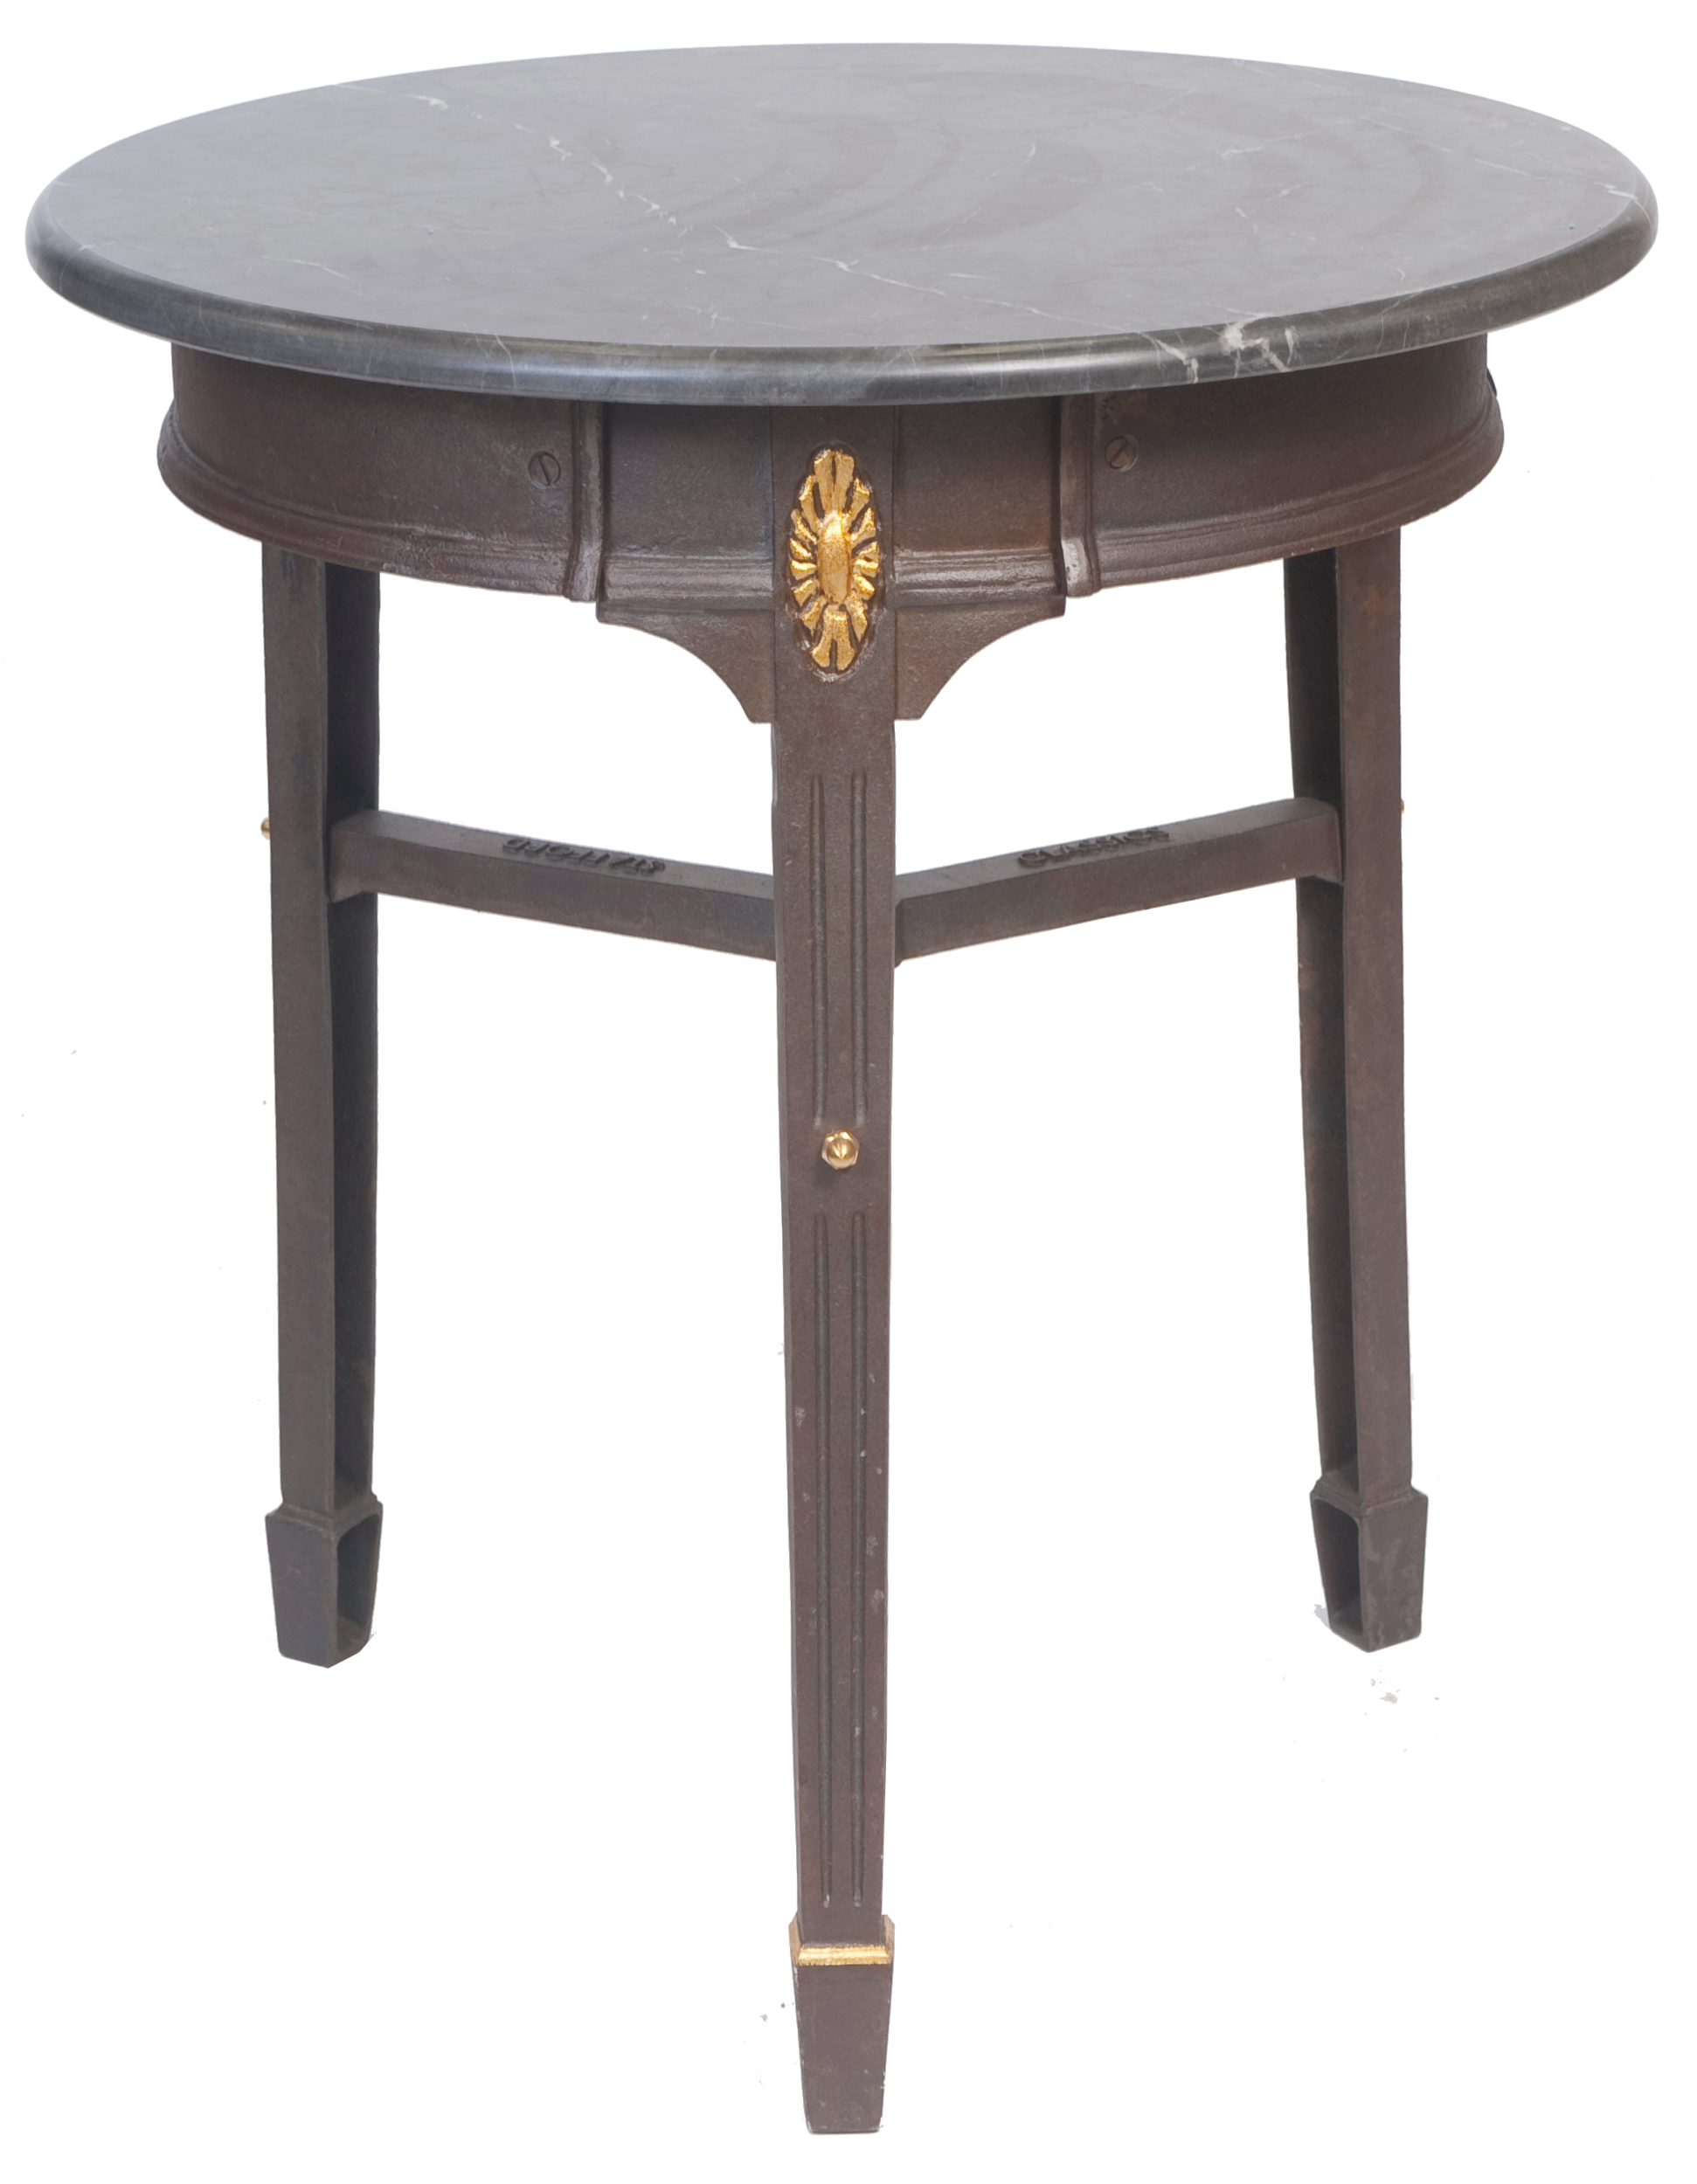 Sheraton Cast Iron Table Base Sheraton Style Dining Table